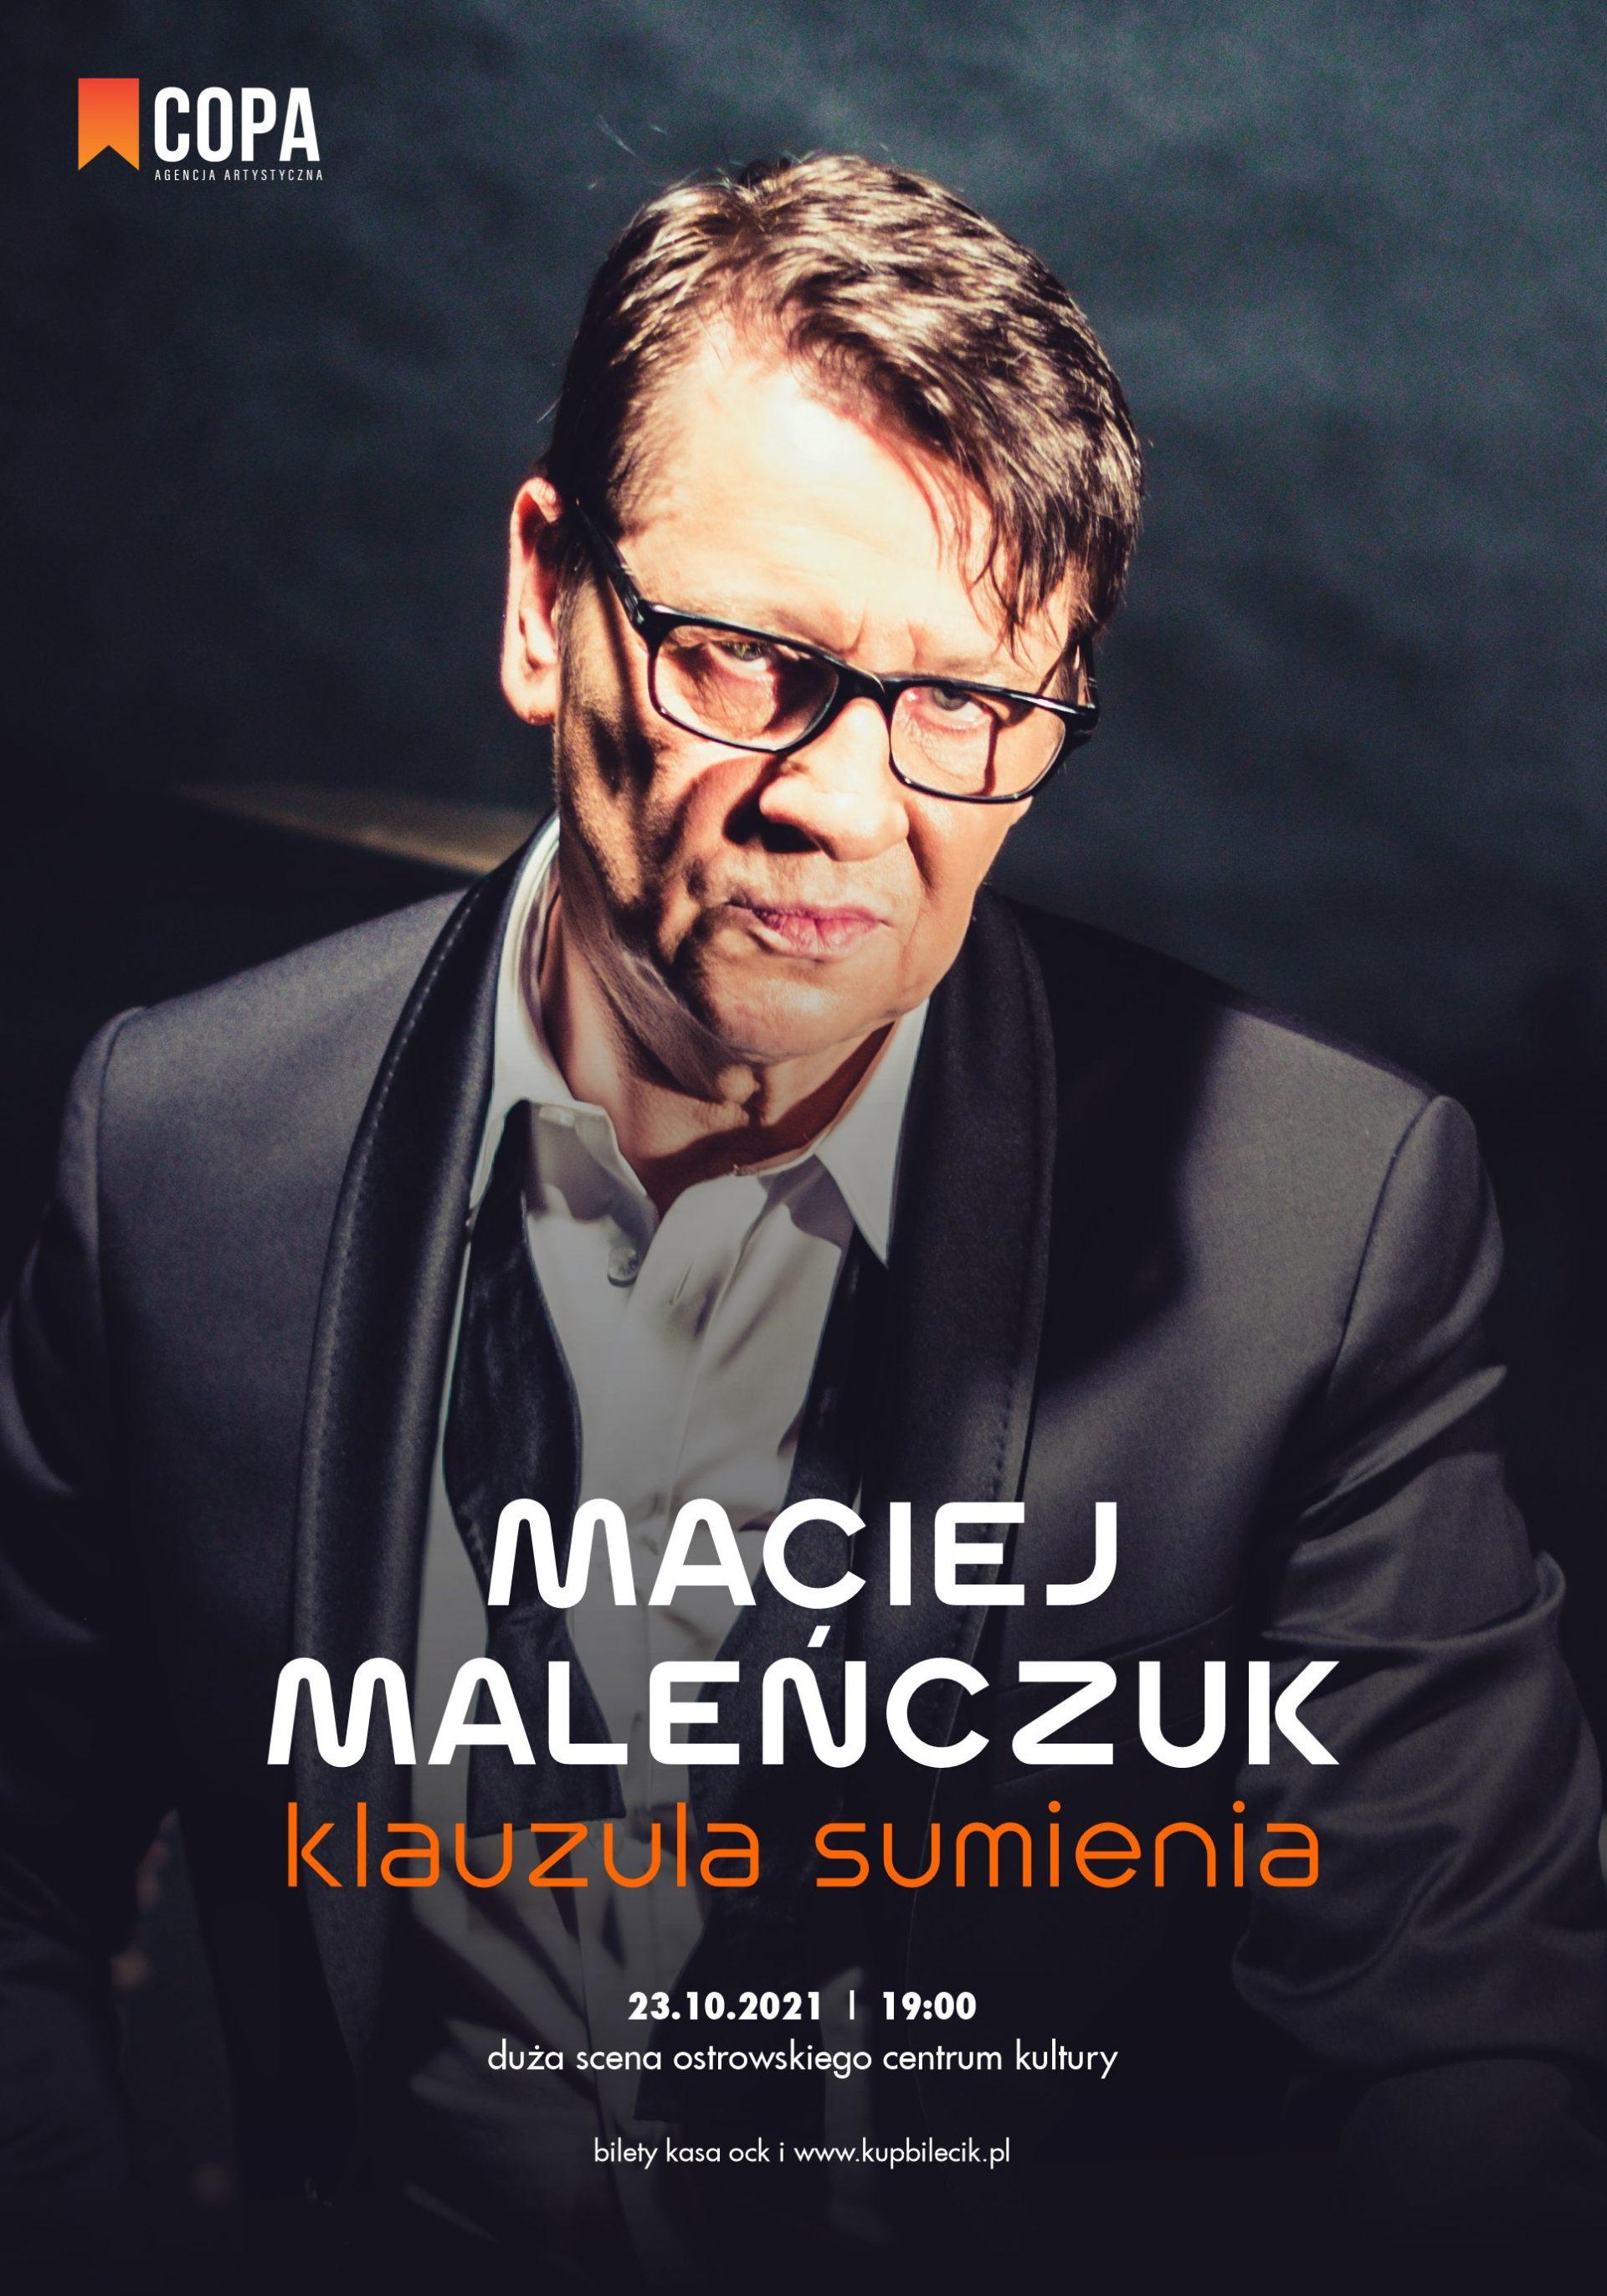 Maciej Maleńczuk | Klauzula Sumienia